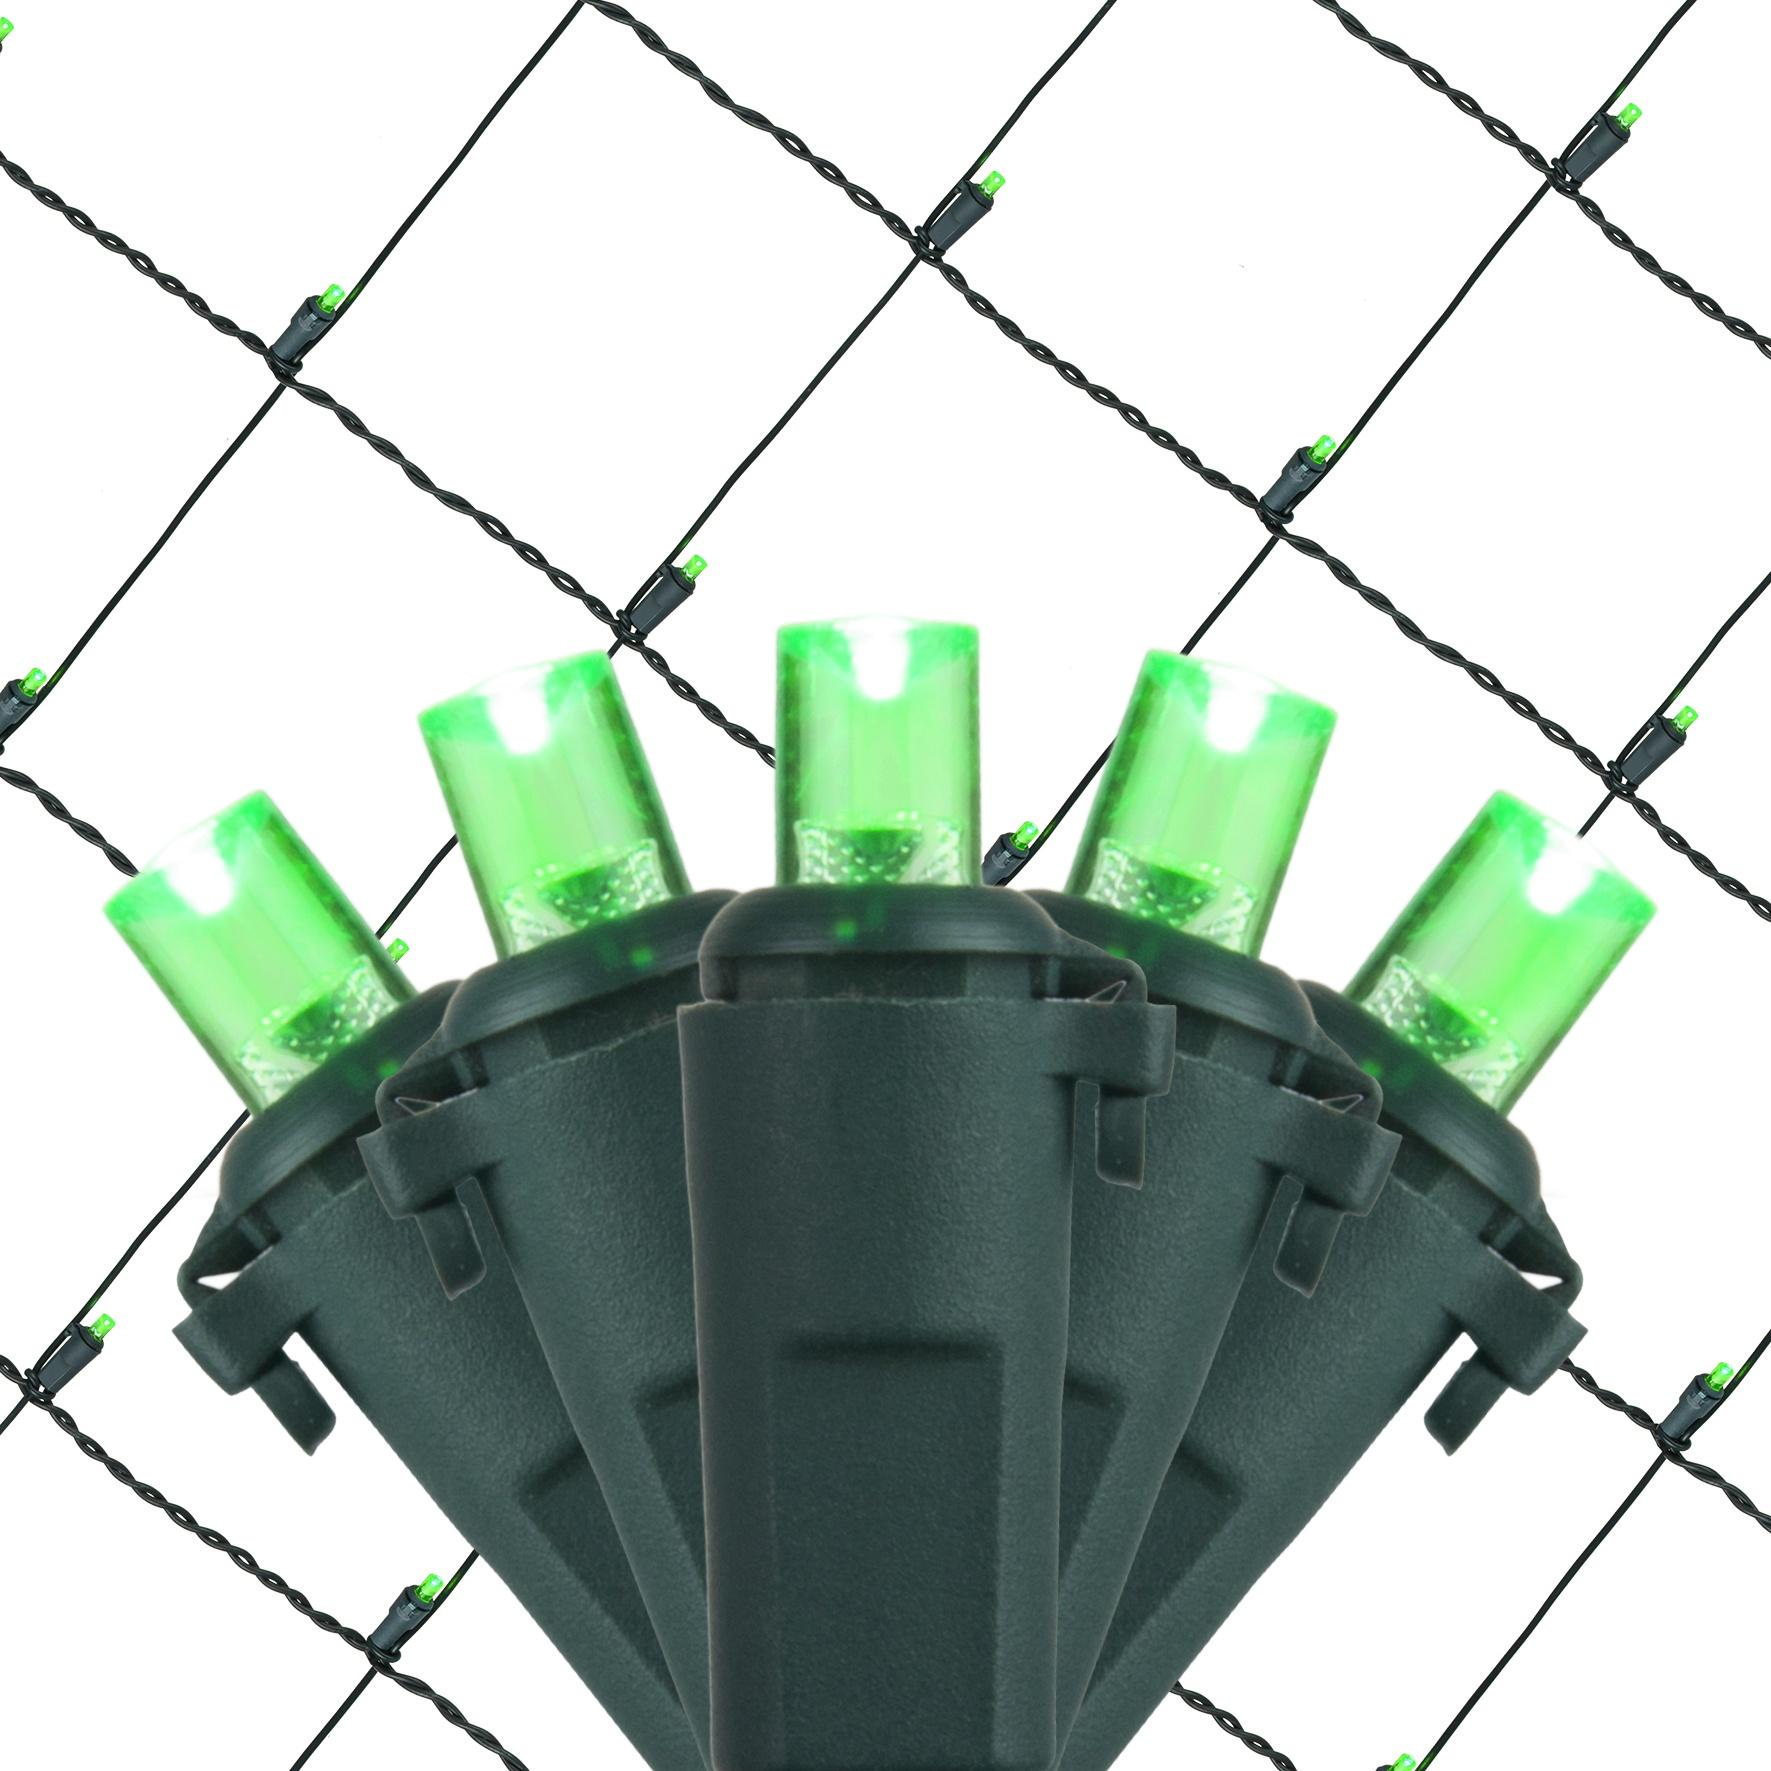 LED Net Lights - 5MM 4'x6' Green LED Net Lights, Green Wire